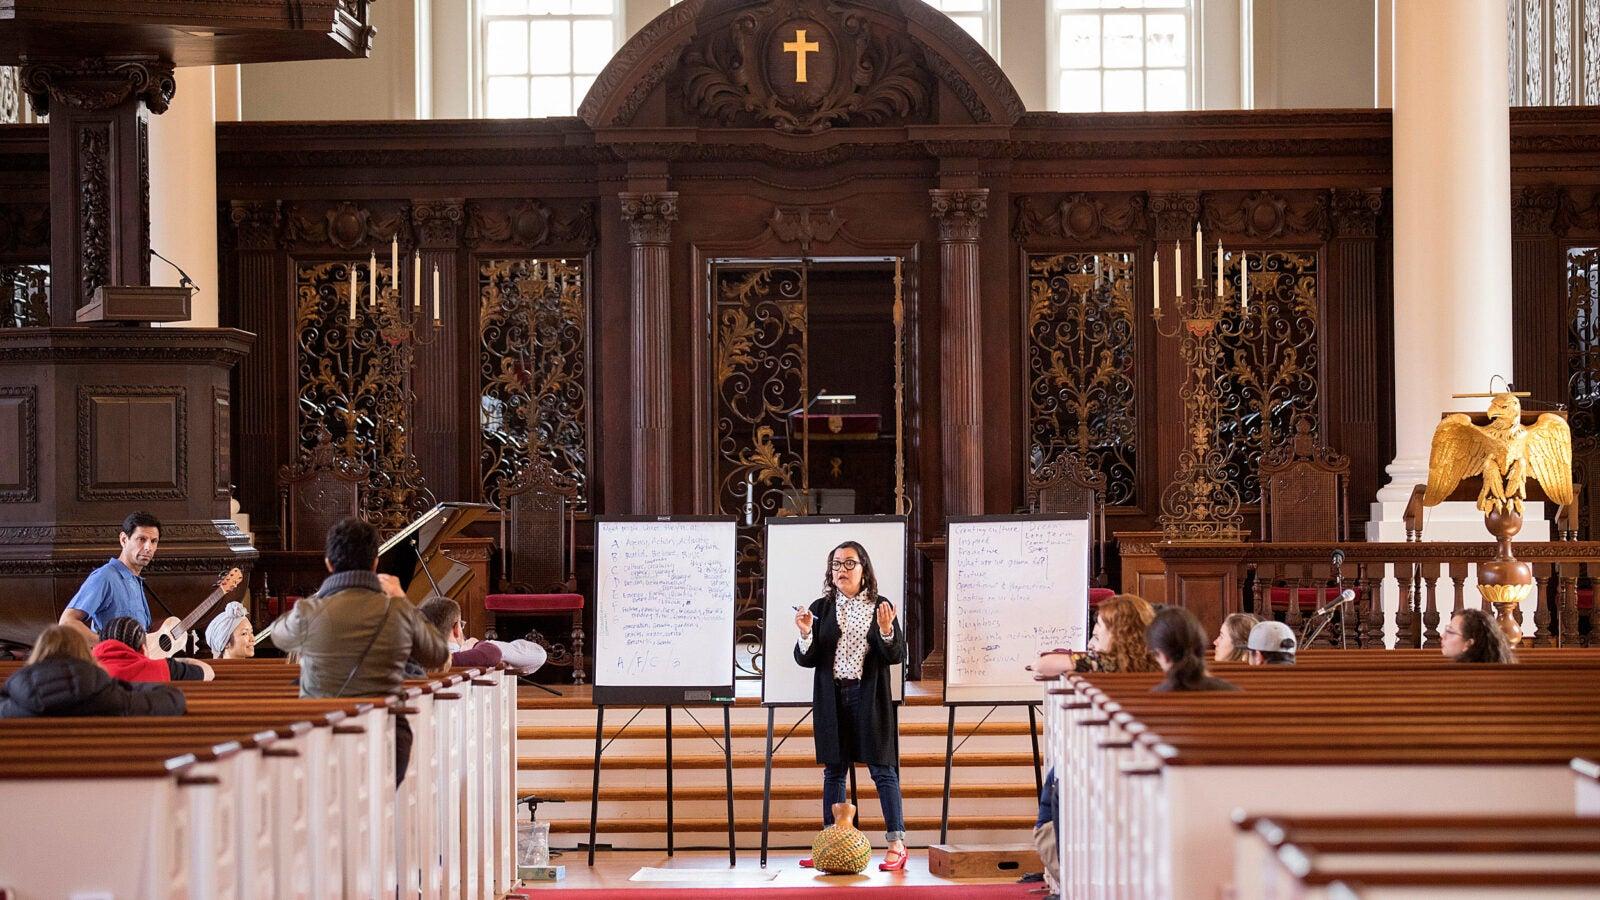 Martha Gonzalez leads a songwriting workshop at Memorial Church.